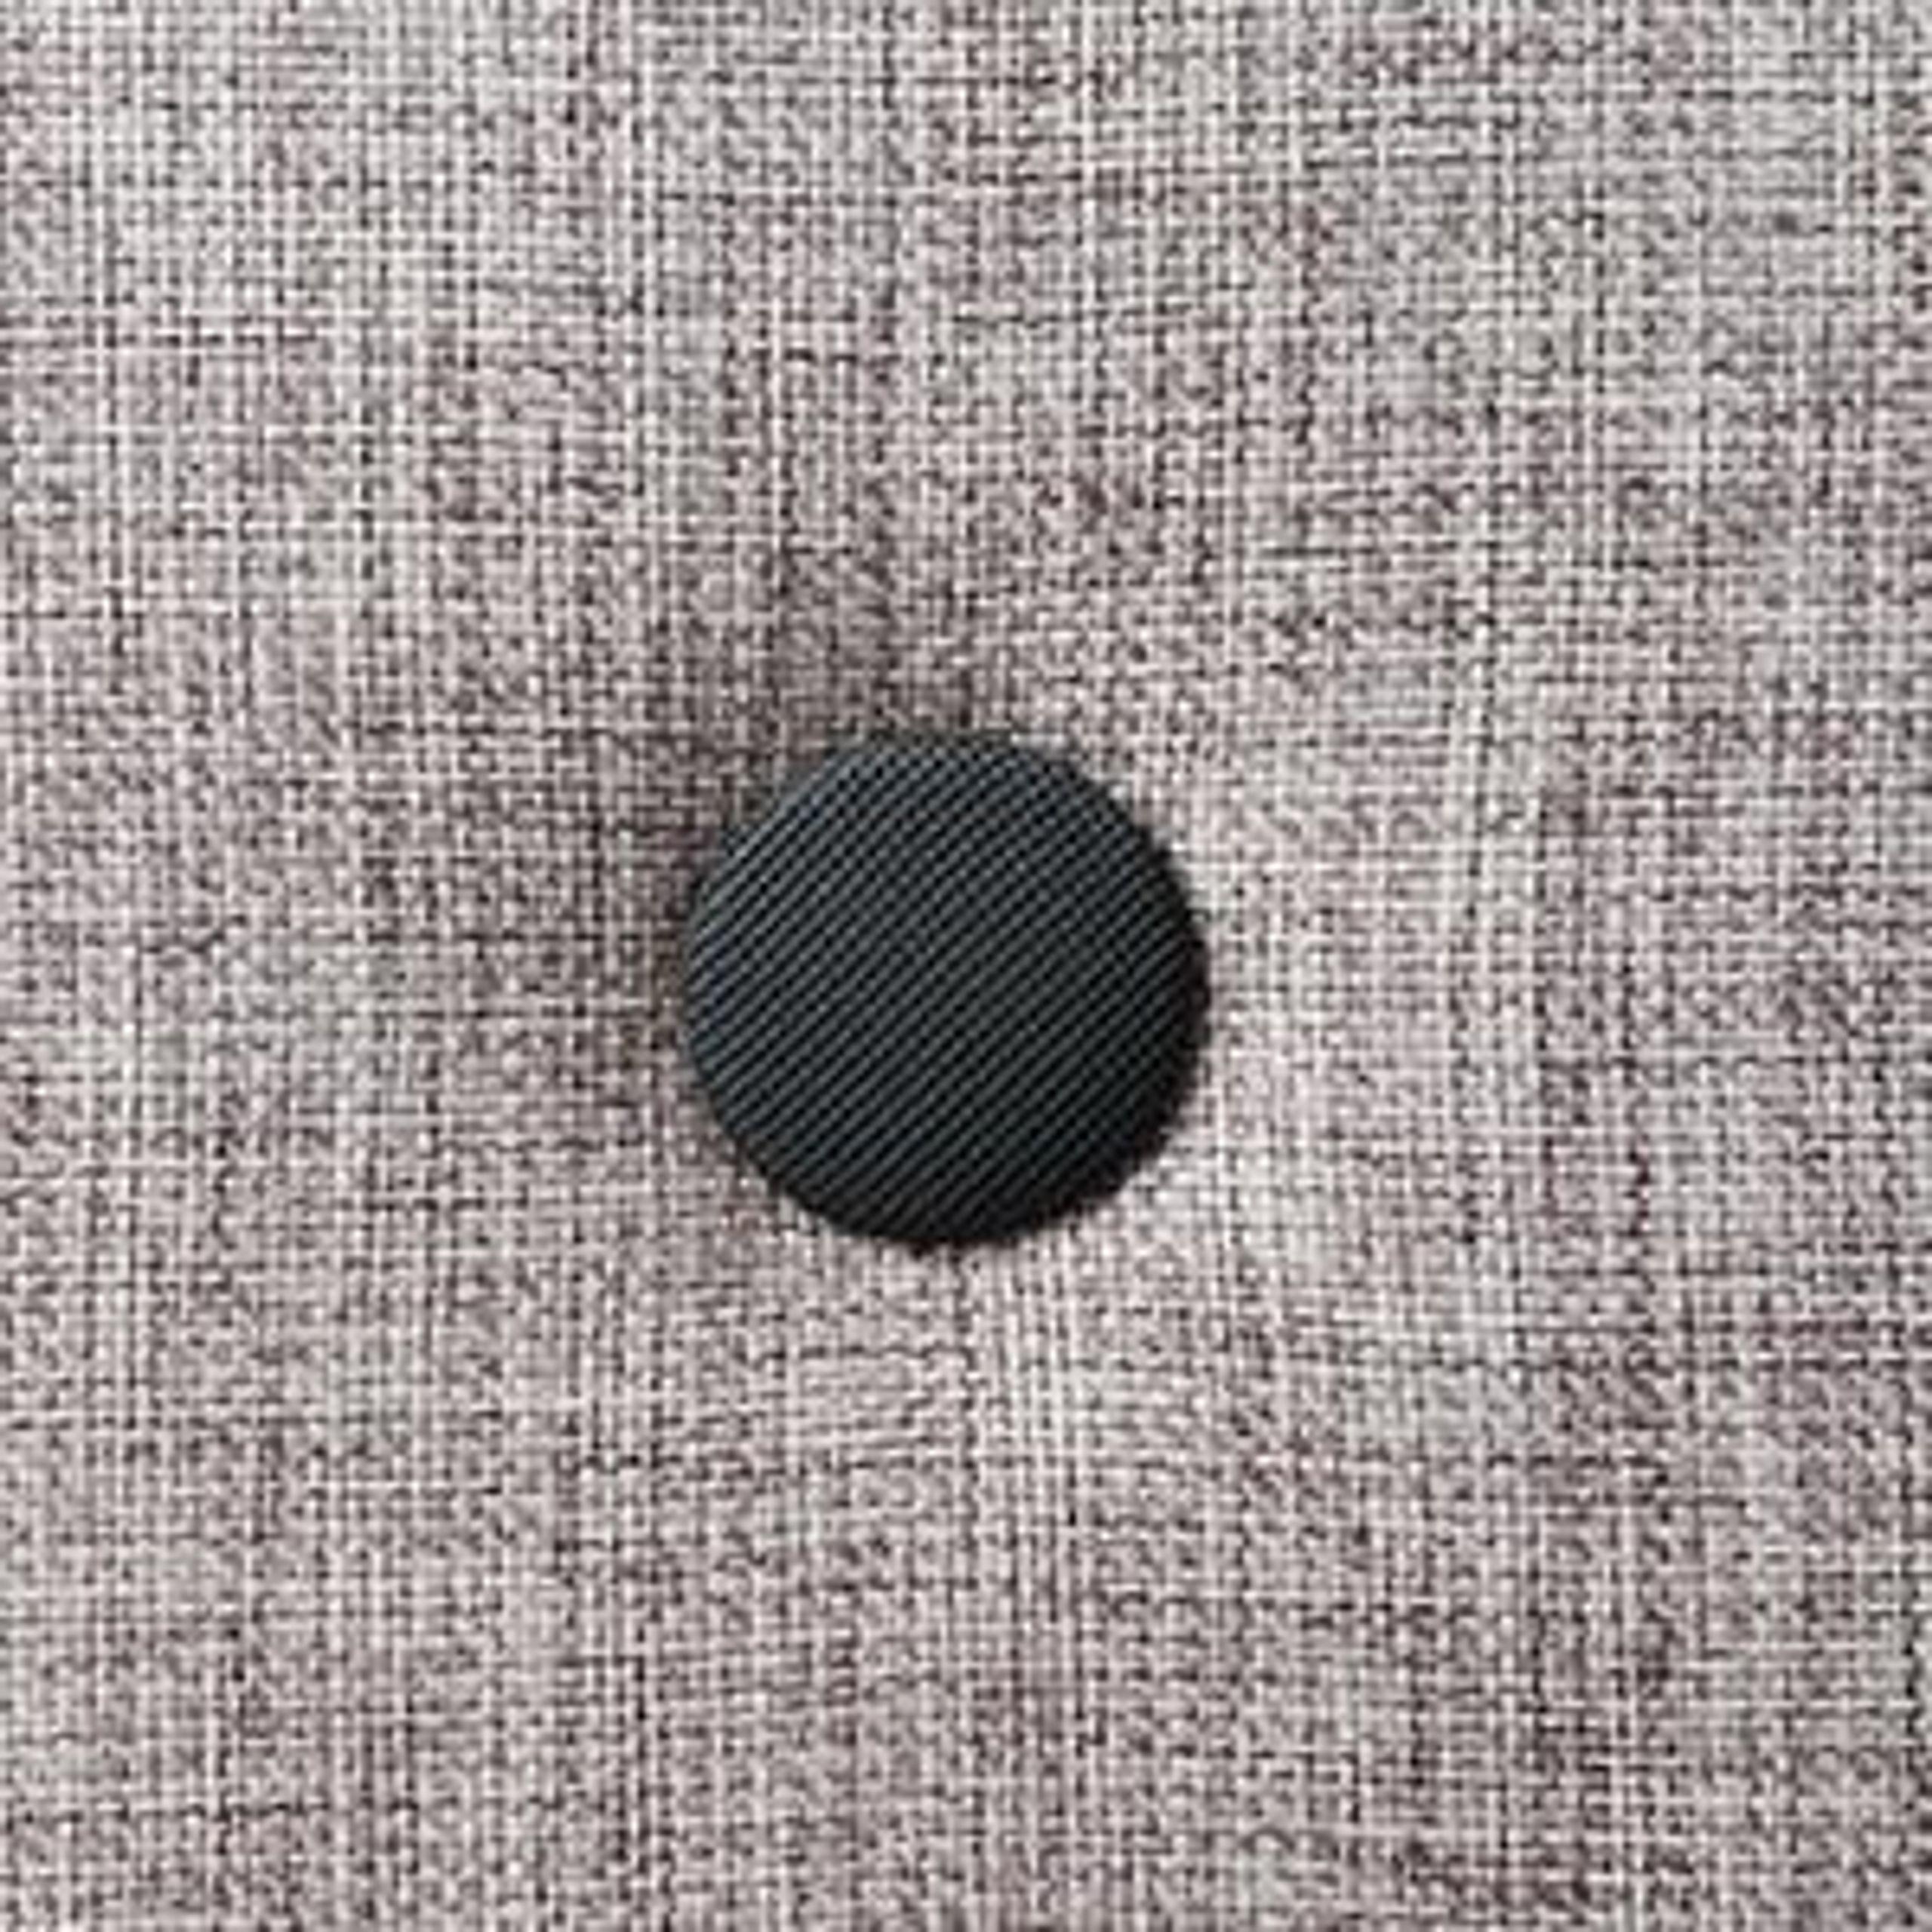 2440b610a32 ... By KlipKlap - Couch - KK 3 fold sofa w. buttons - Multi grey w